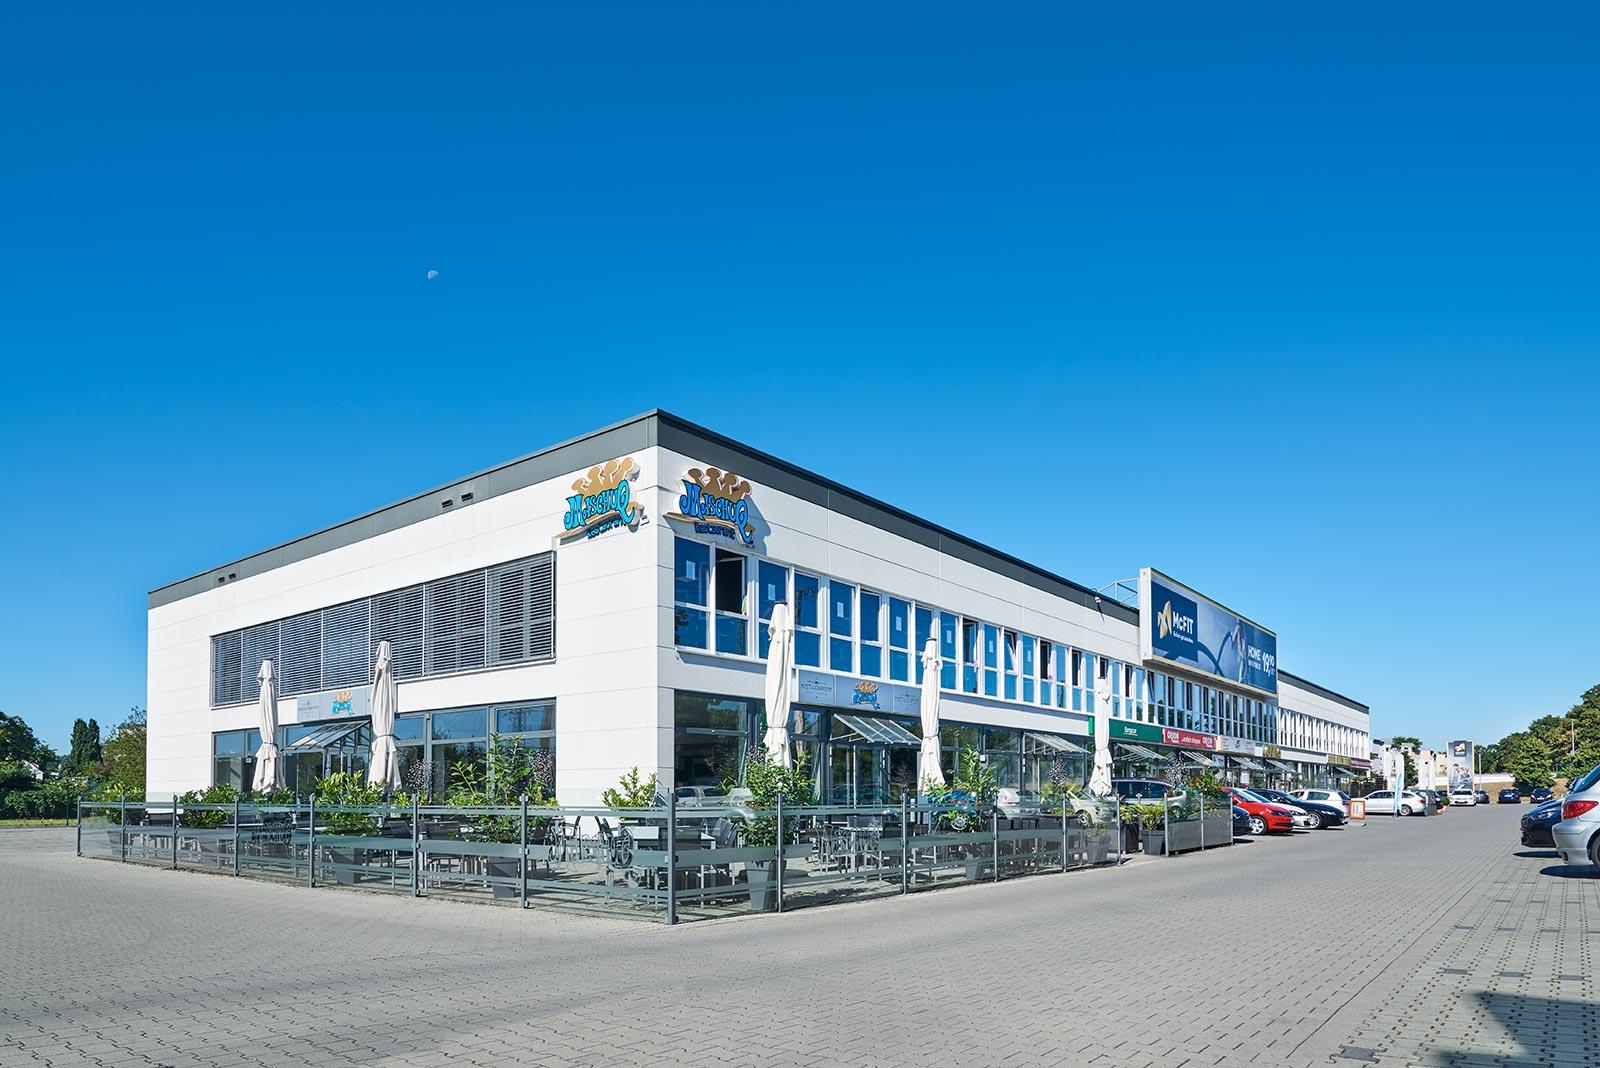 Immobilie in Hanau: Gastronomie / Fitnessstudio / Einzelhandel, Tankstelle